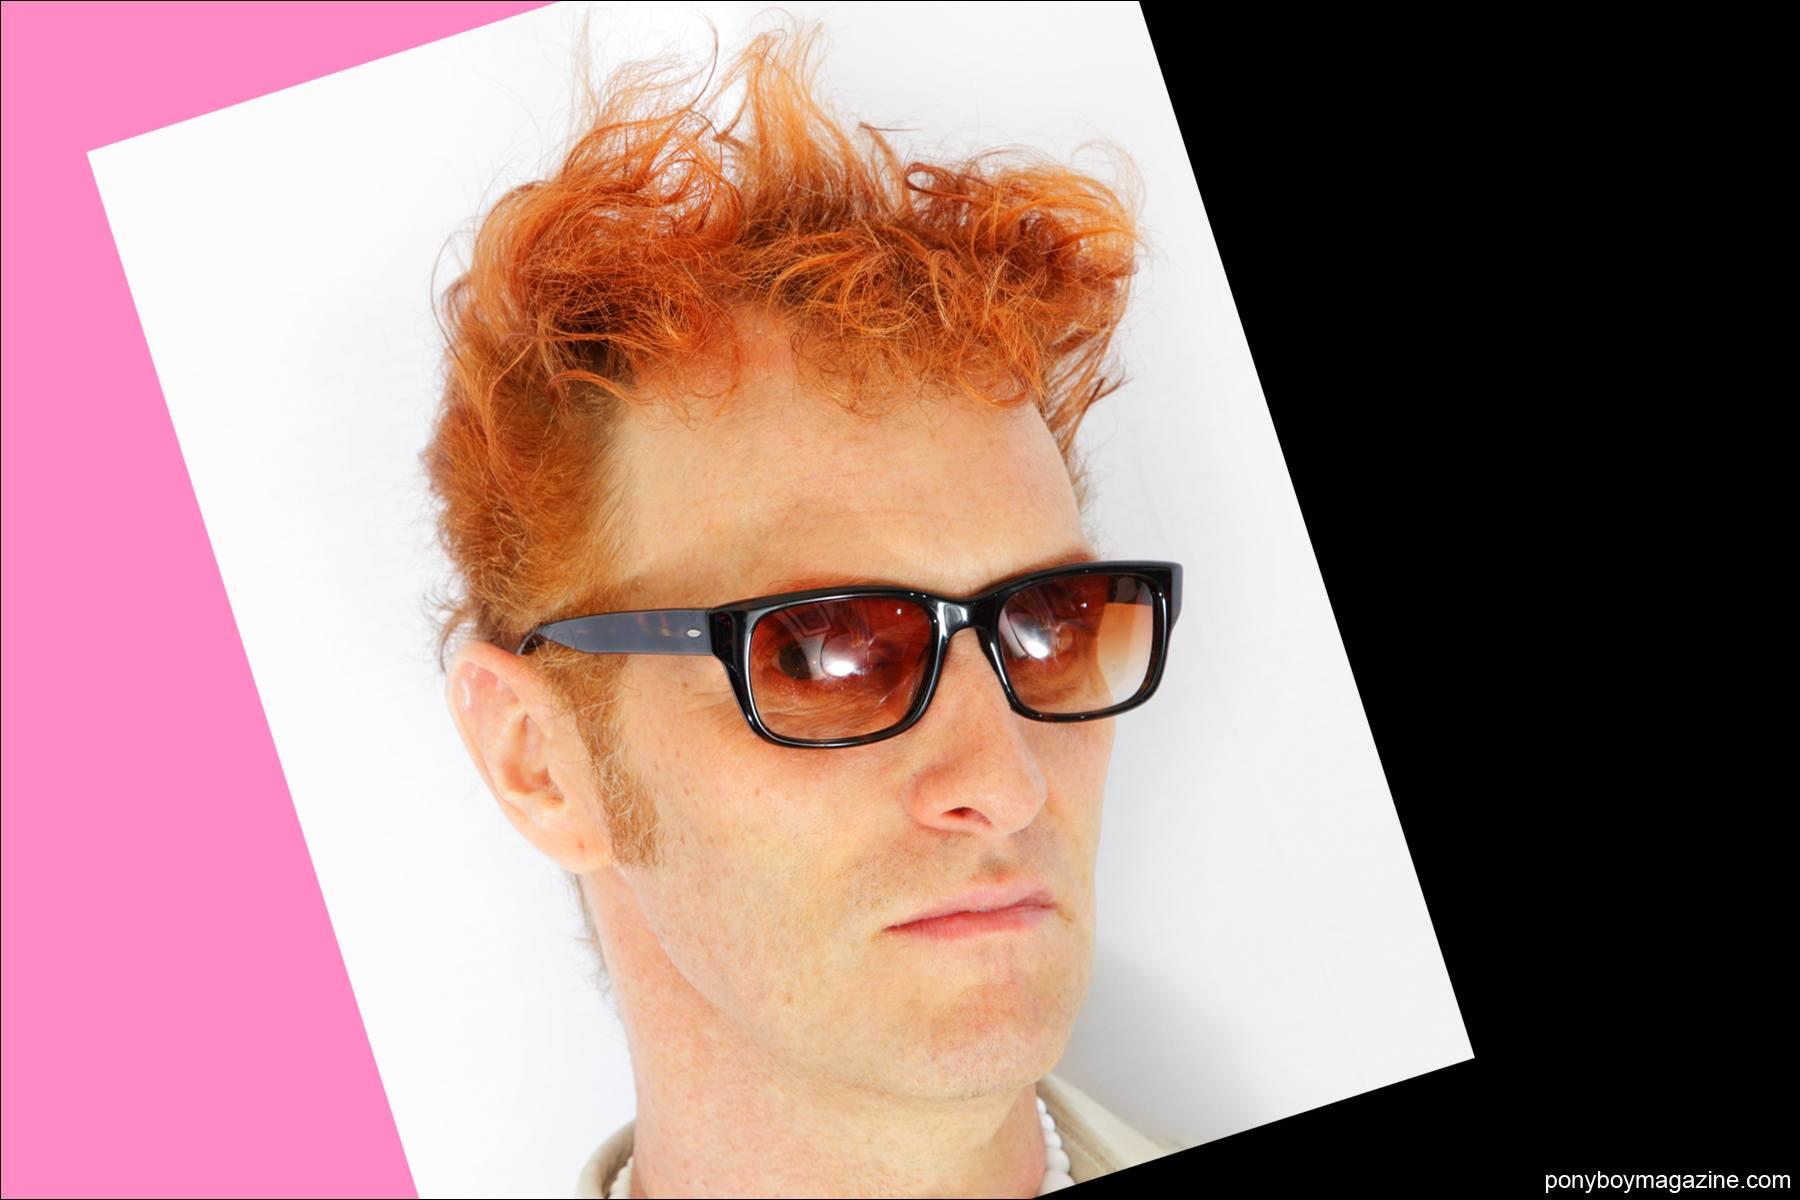 Headshot of musician Tim Polecat. Photographed by Alexander Thompson for Ponyboy Magazine NY.